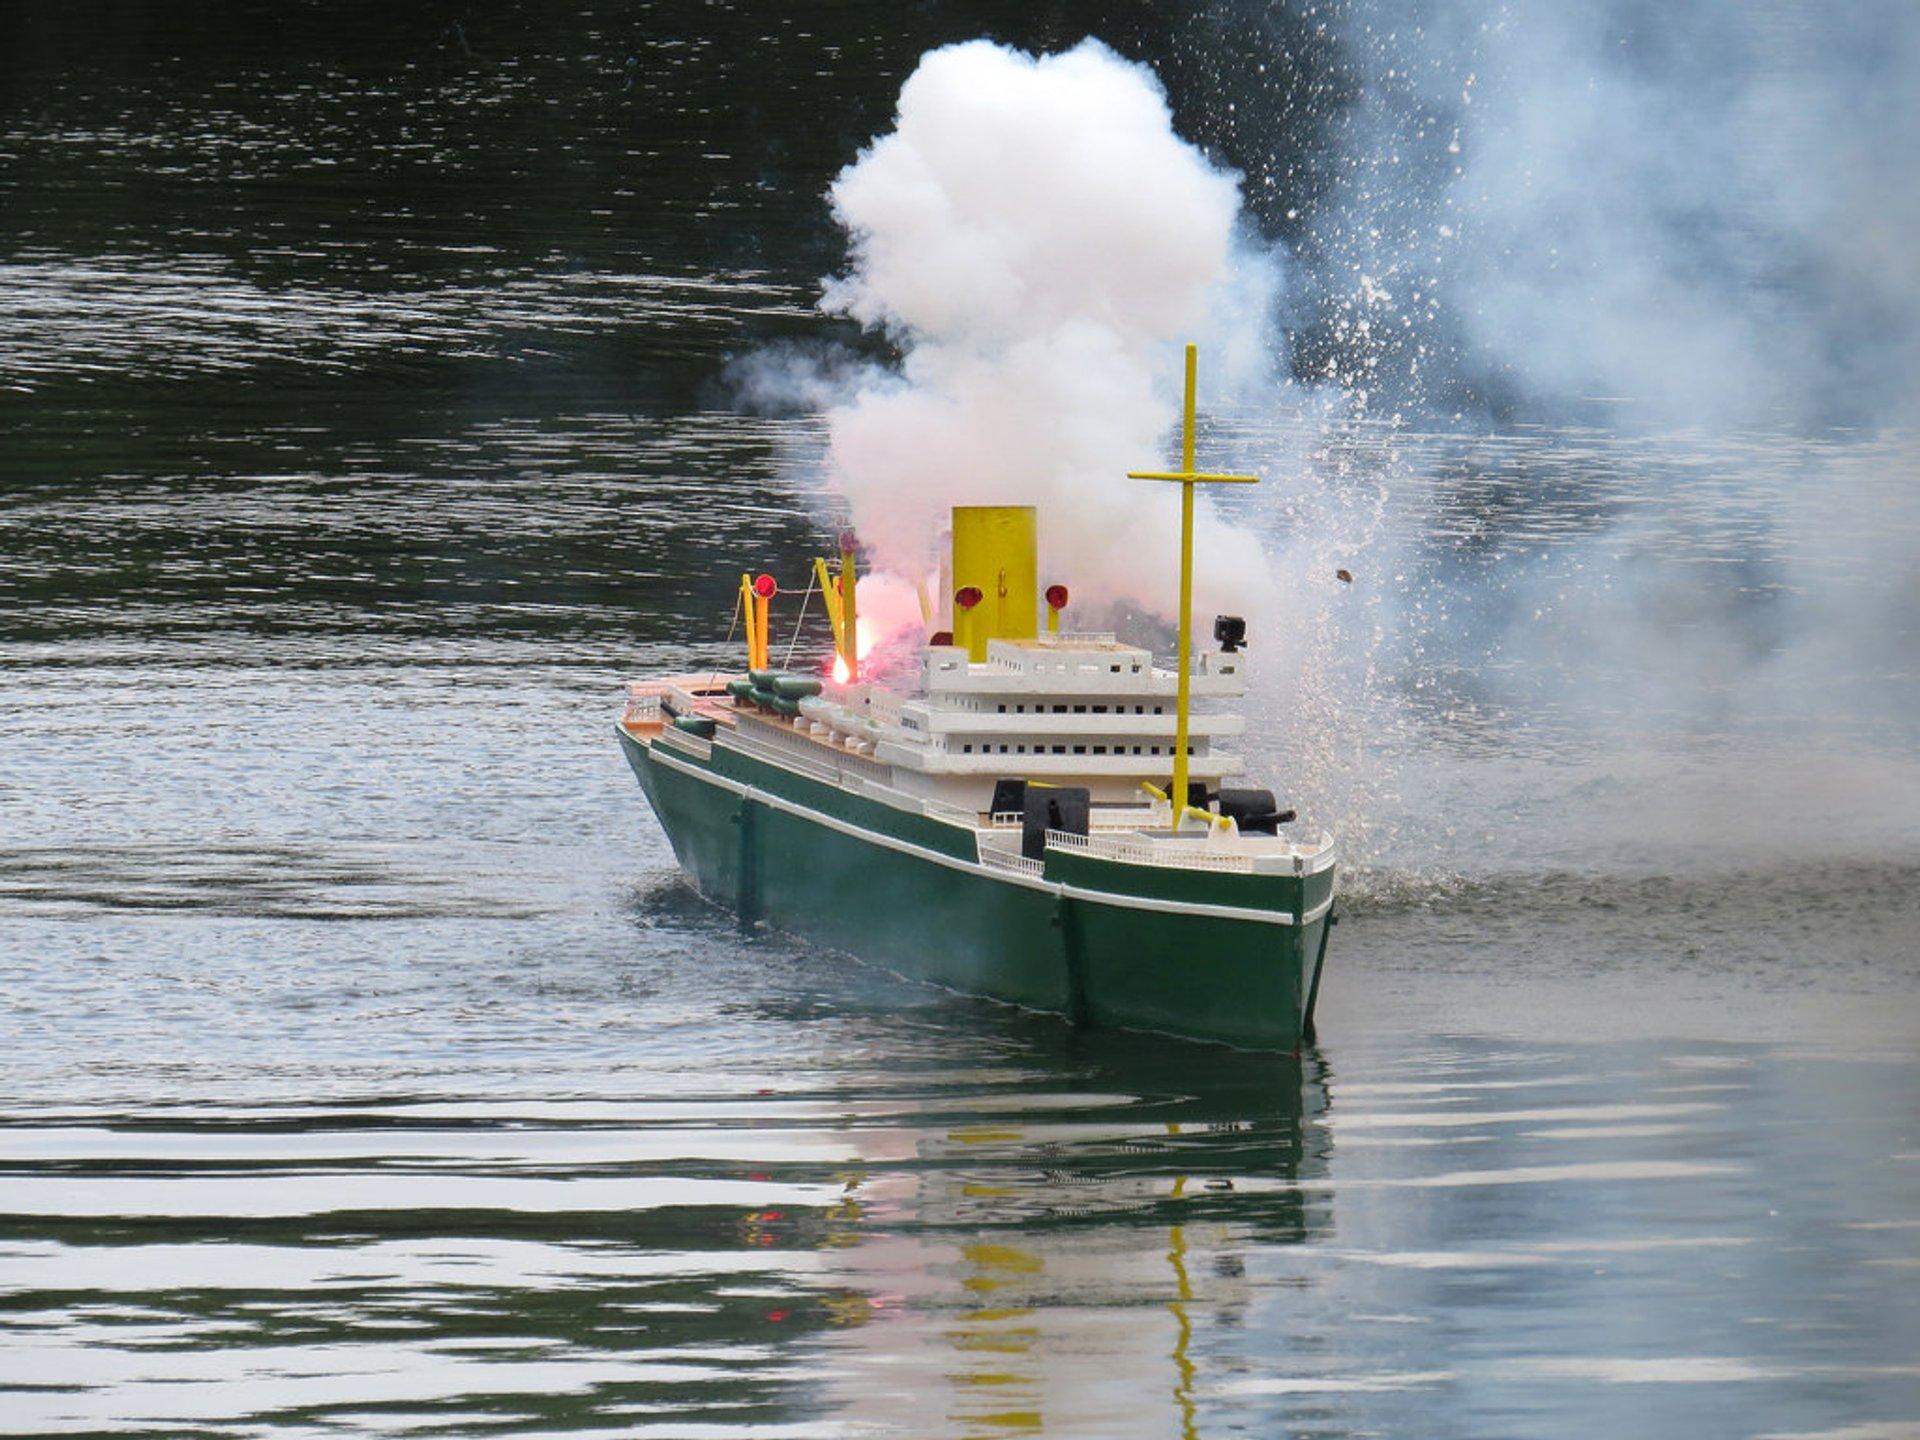 Peasholm Park Naval Battles in England 2020 - Best Time